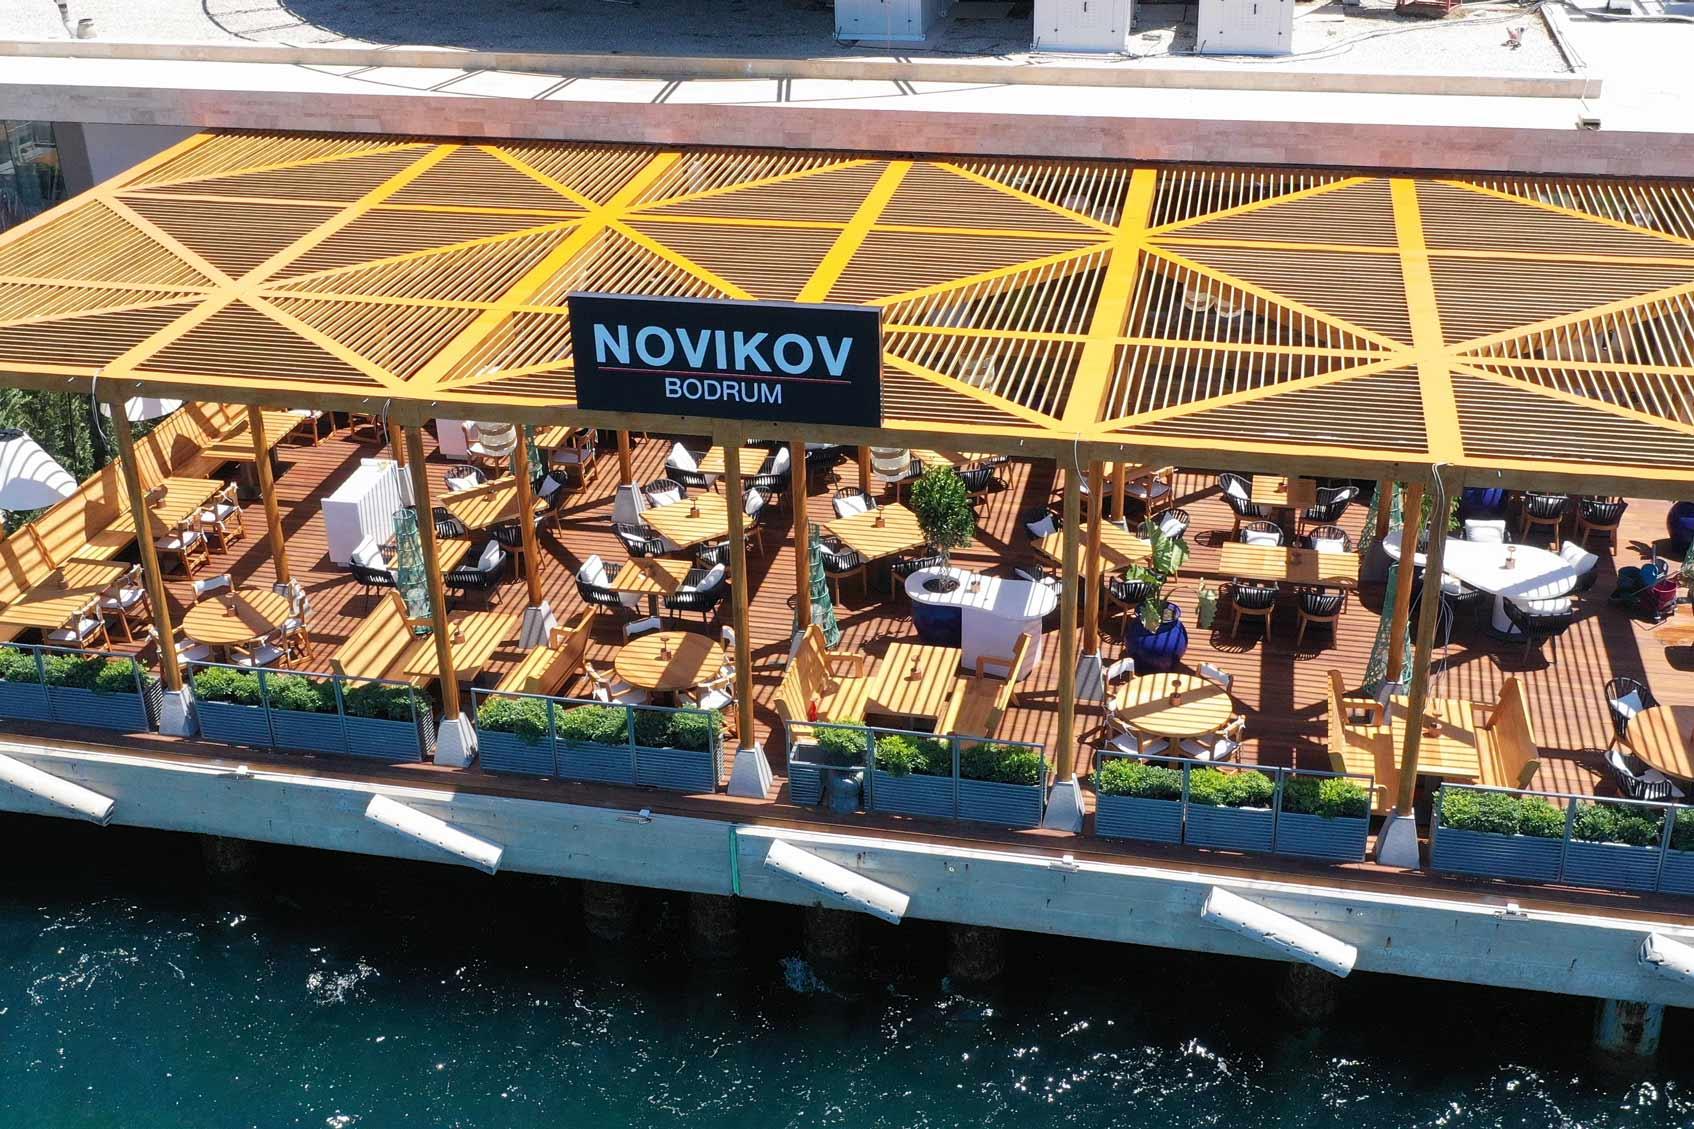 Novikov Bodrum ресторан Аркадия Новикова